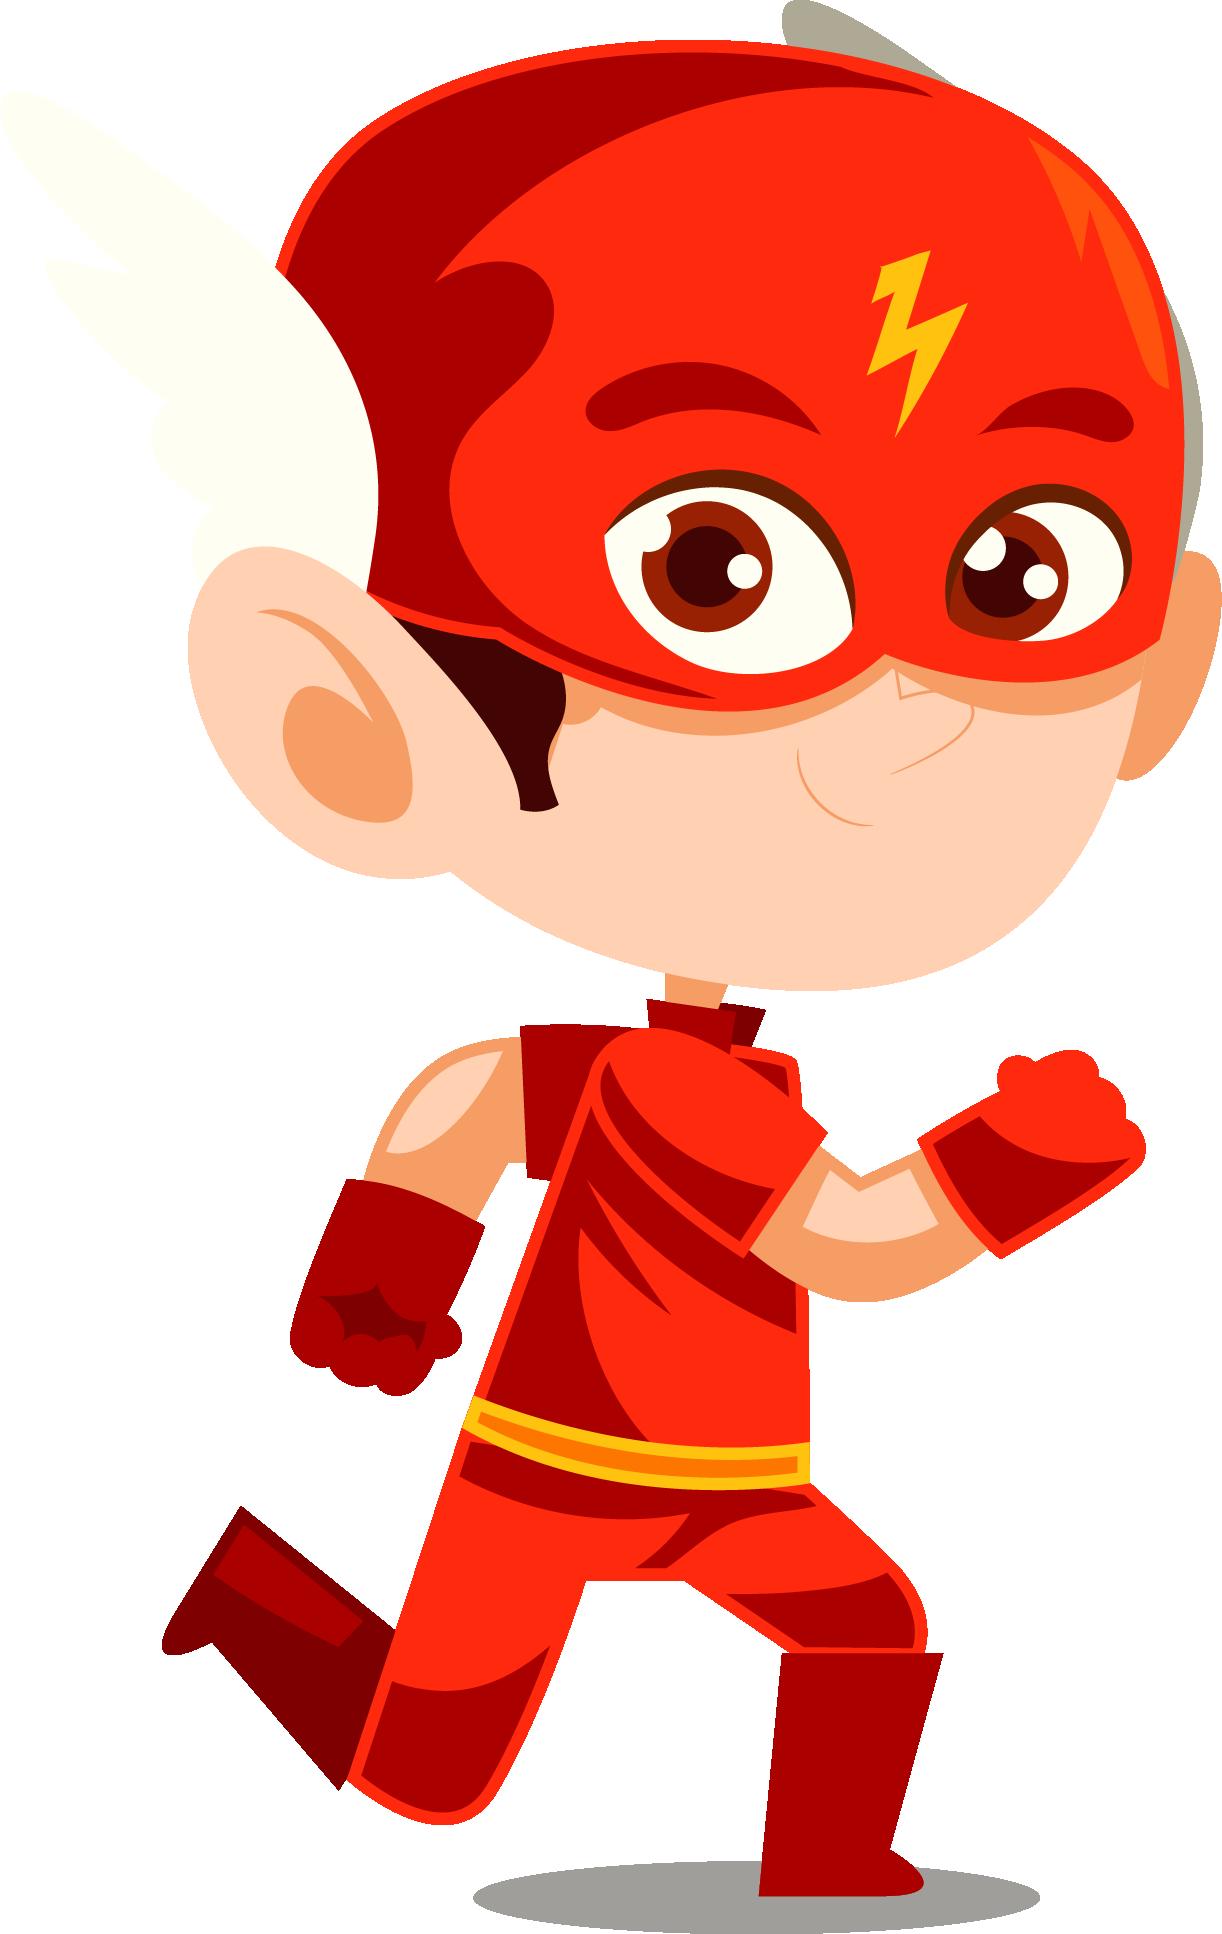 The flash png images. Clipart boy superhero